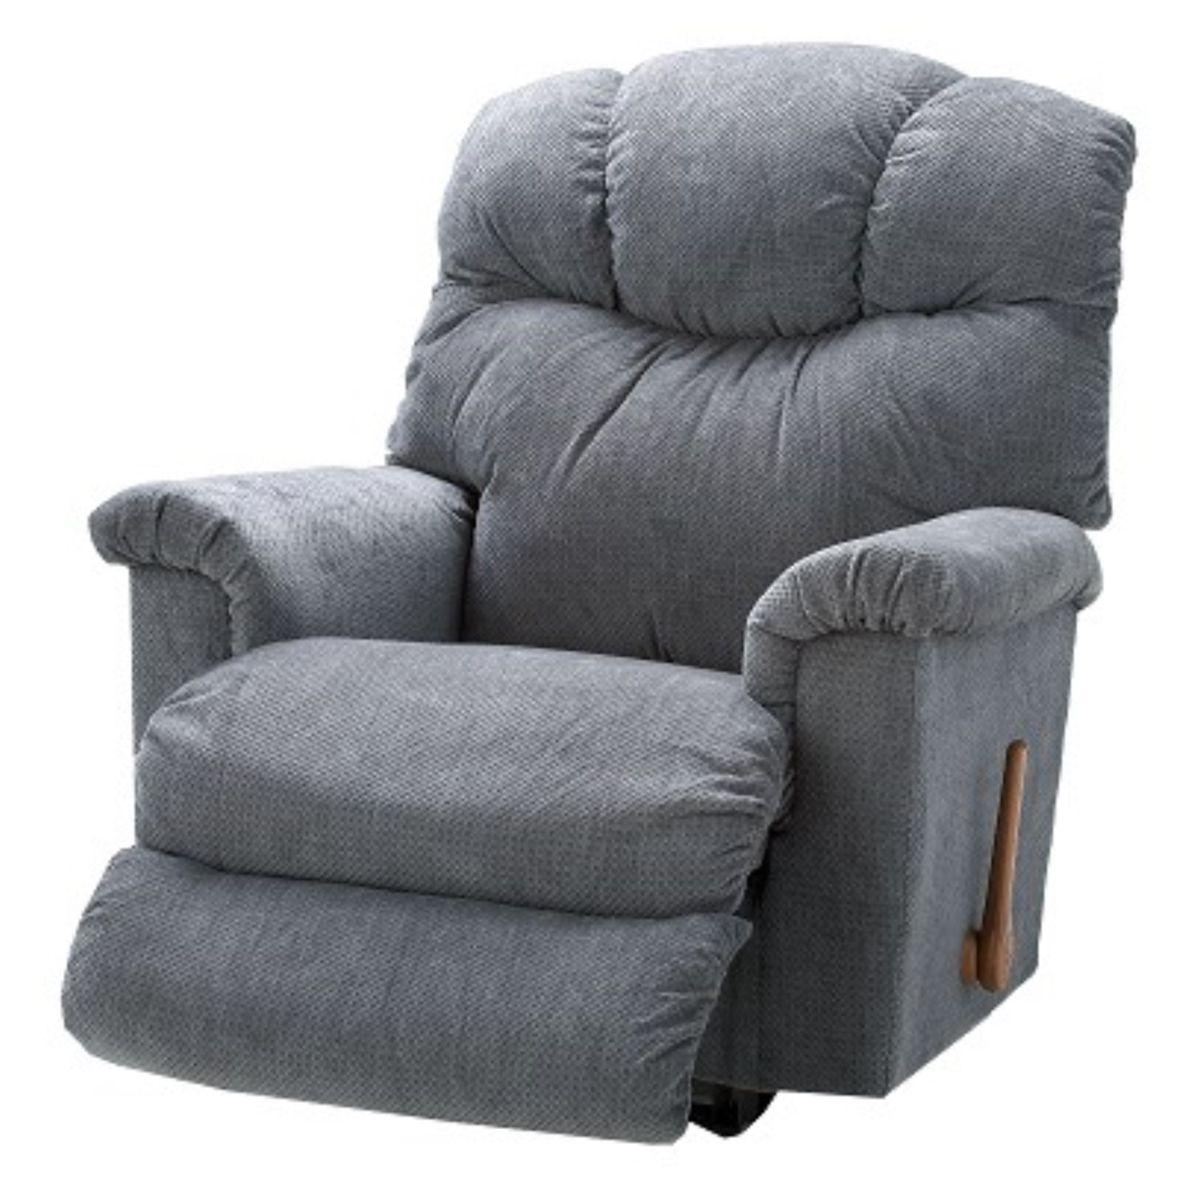 Franco Iii Fabric Swivel Rocker Recliners For Well Known La Z Boy Furniture Showroom (View 5 of 20)